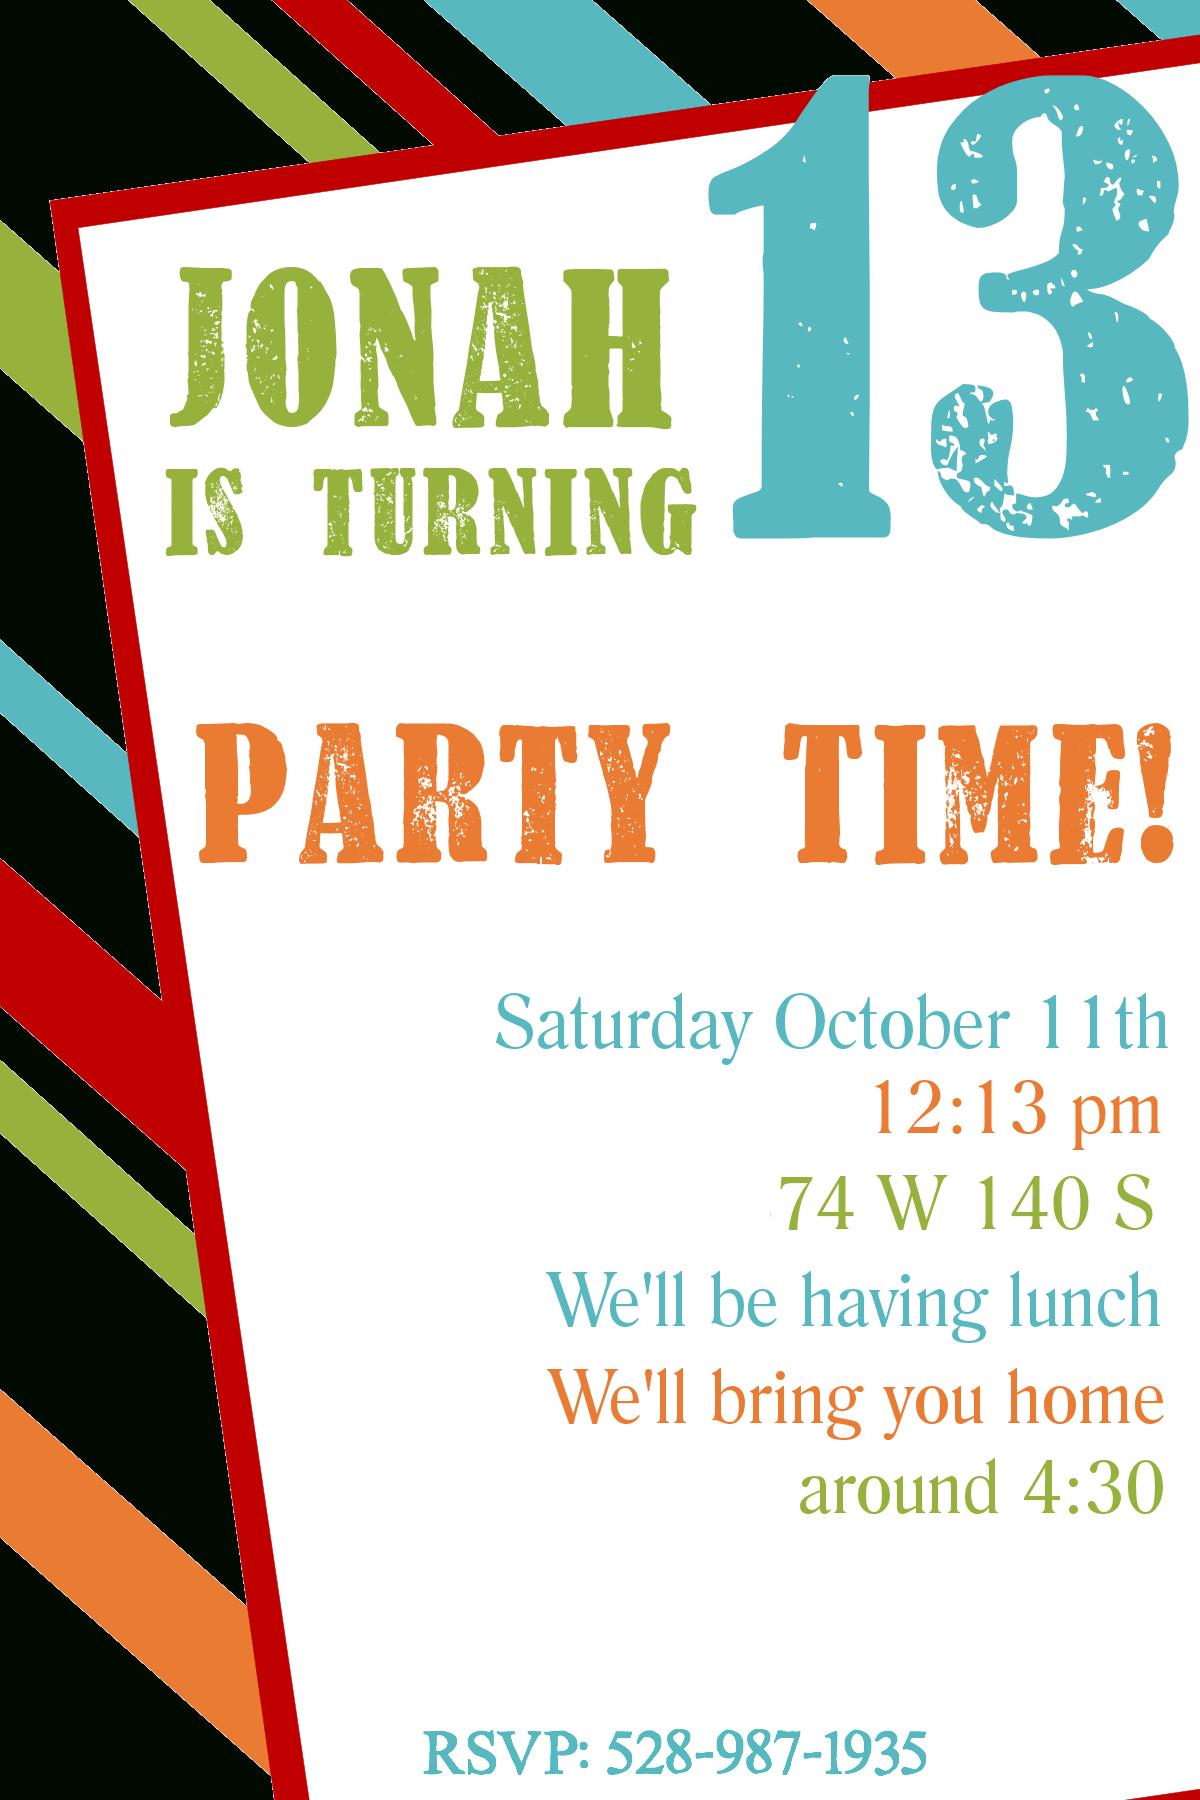 Free Printable Birthday Invitation Templates - 21St Birthday Invitation Templates Free Printable